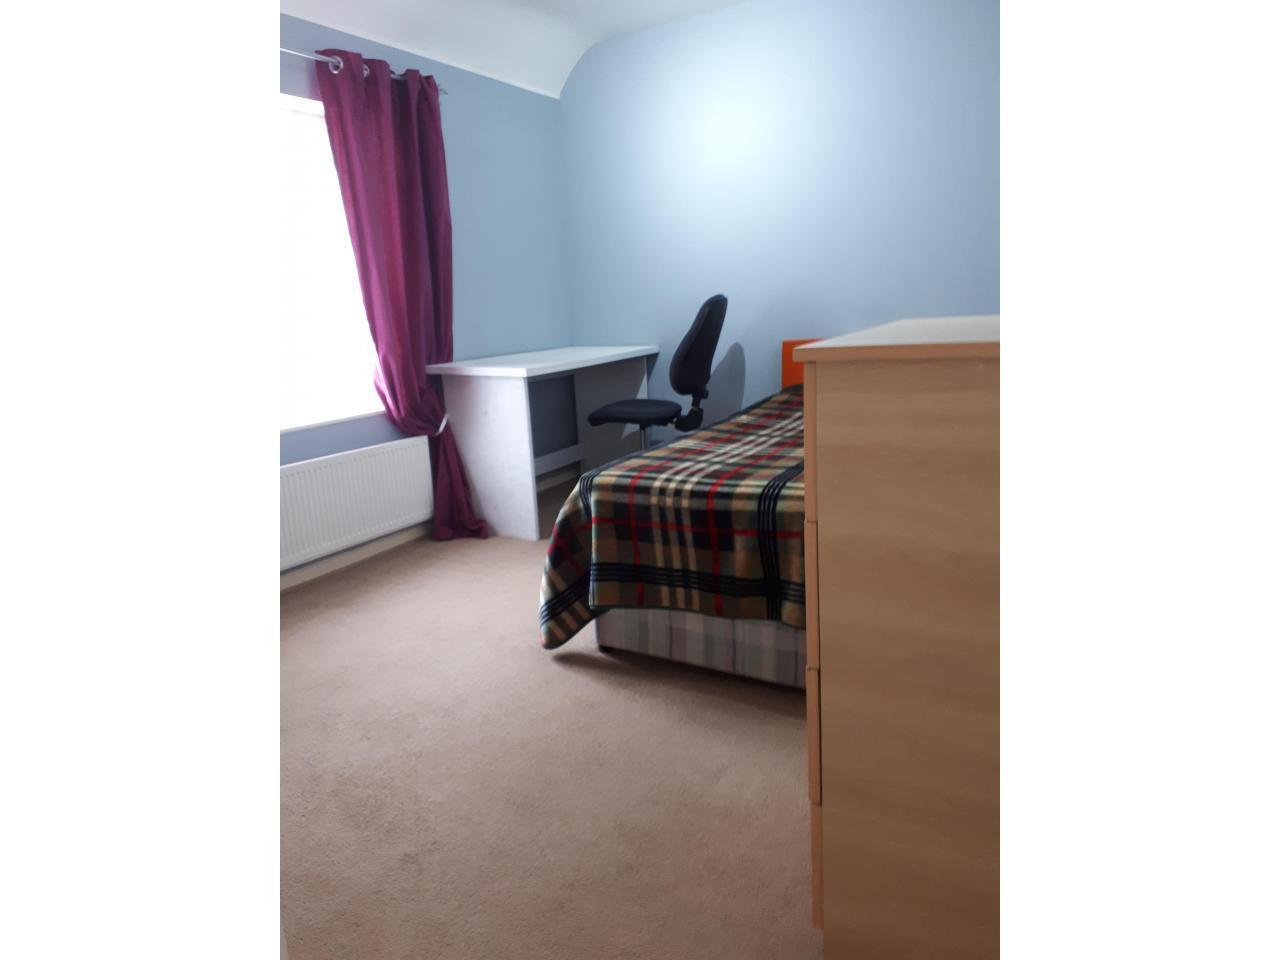 Dagenham, 4 зона, Upney,  большую комнату за 100ф. с 23 августа - 1